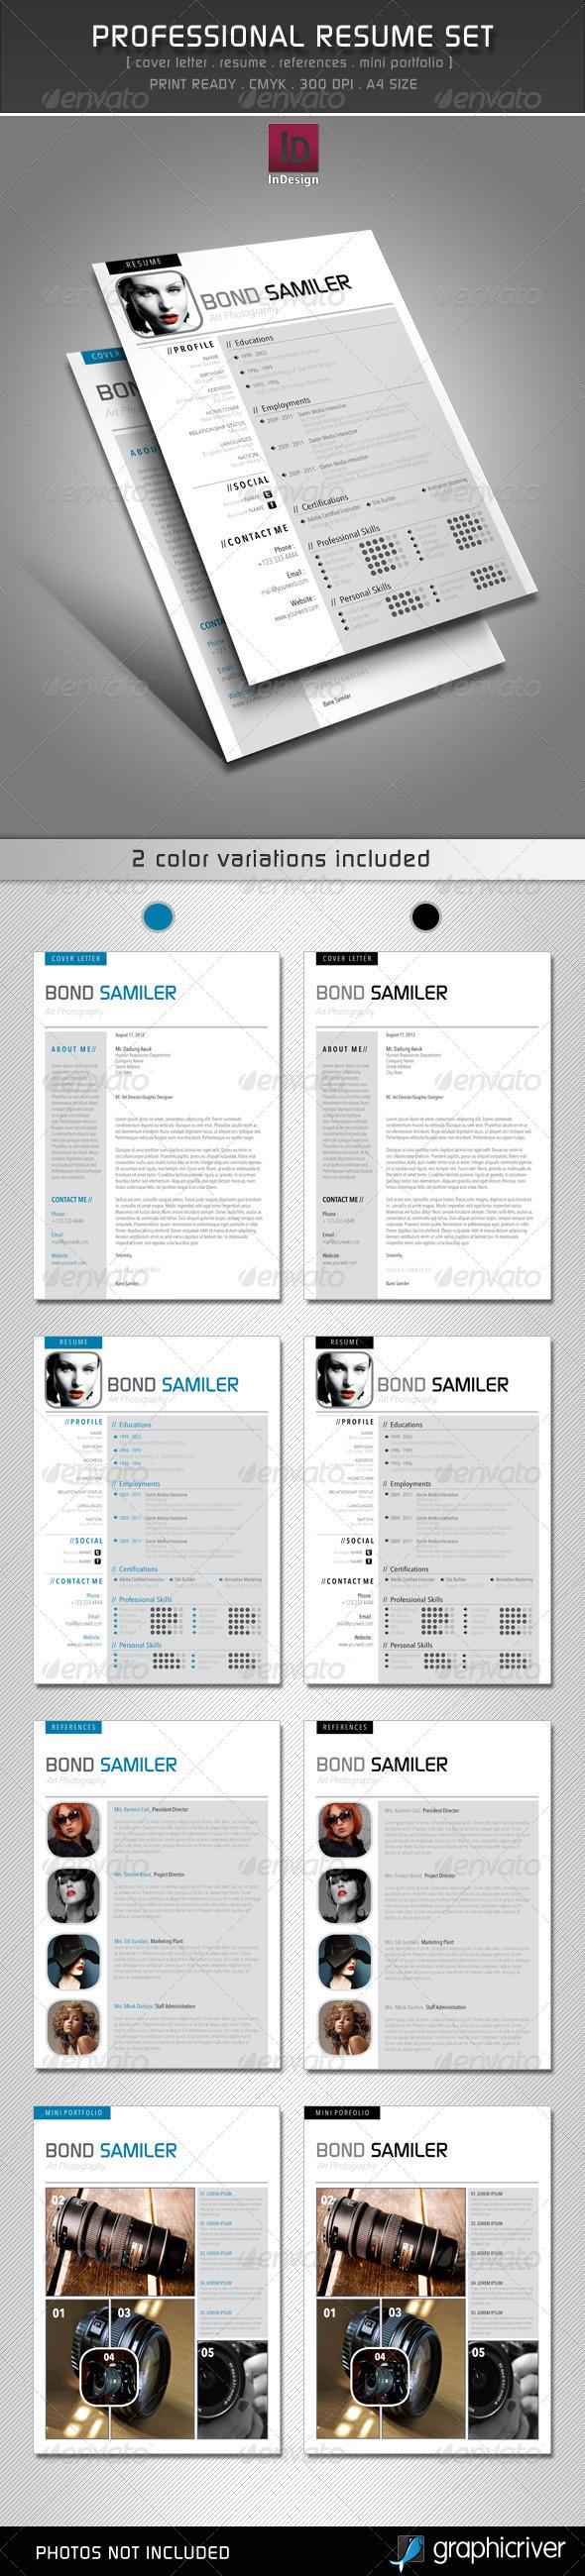 GraphicRiver Professional Resume Set 2601914